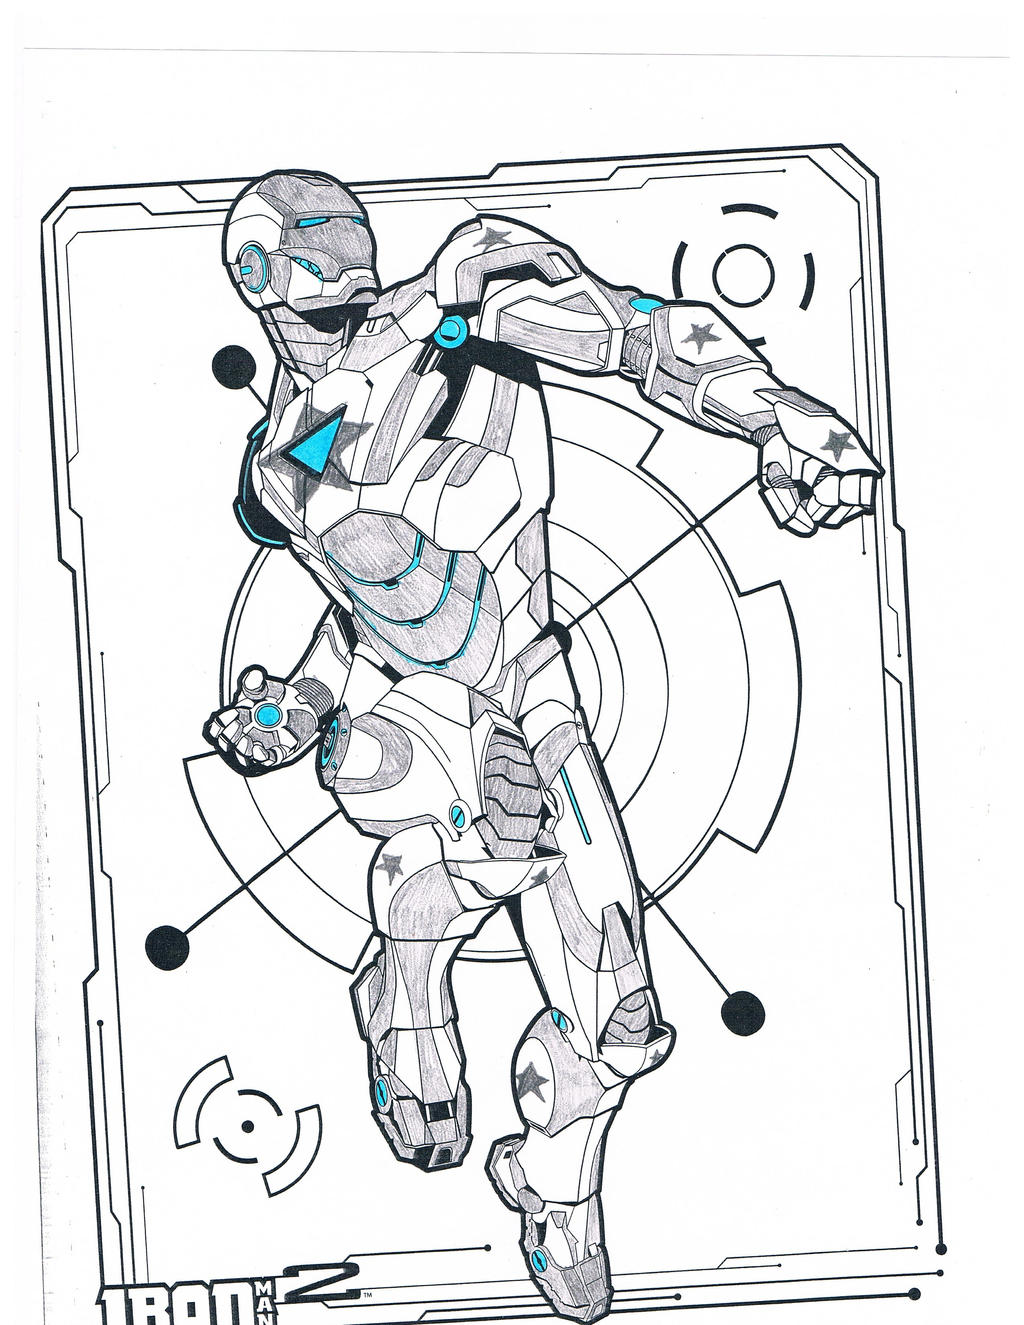 Personalized Iron Man armor by DisturbianWarfare on DeviantArt